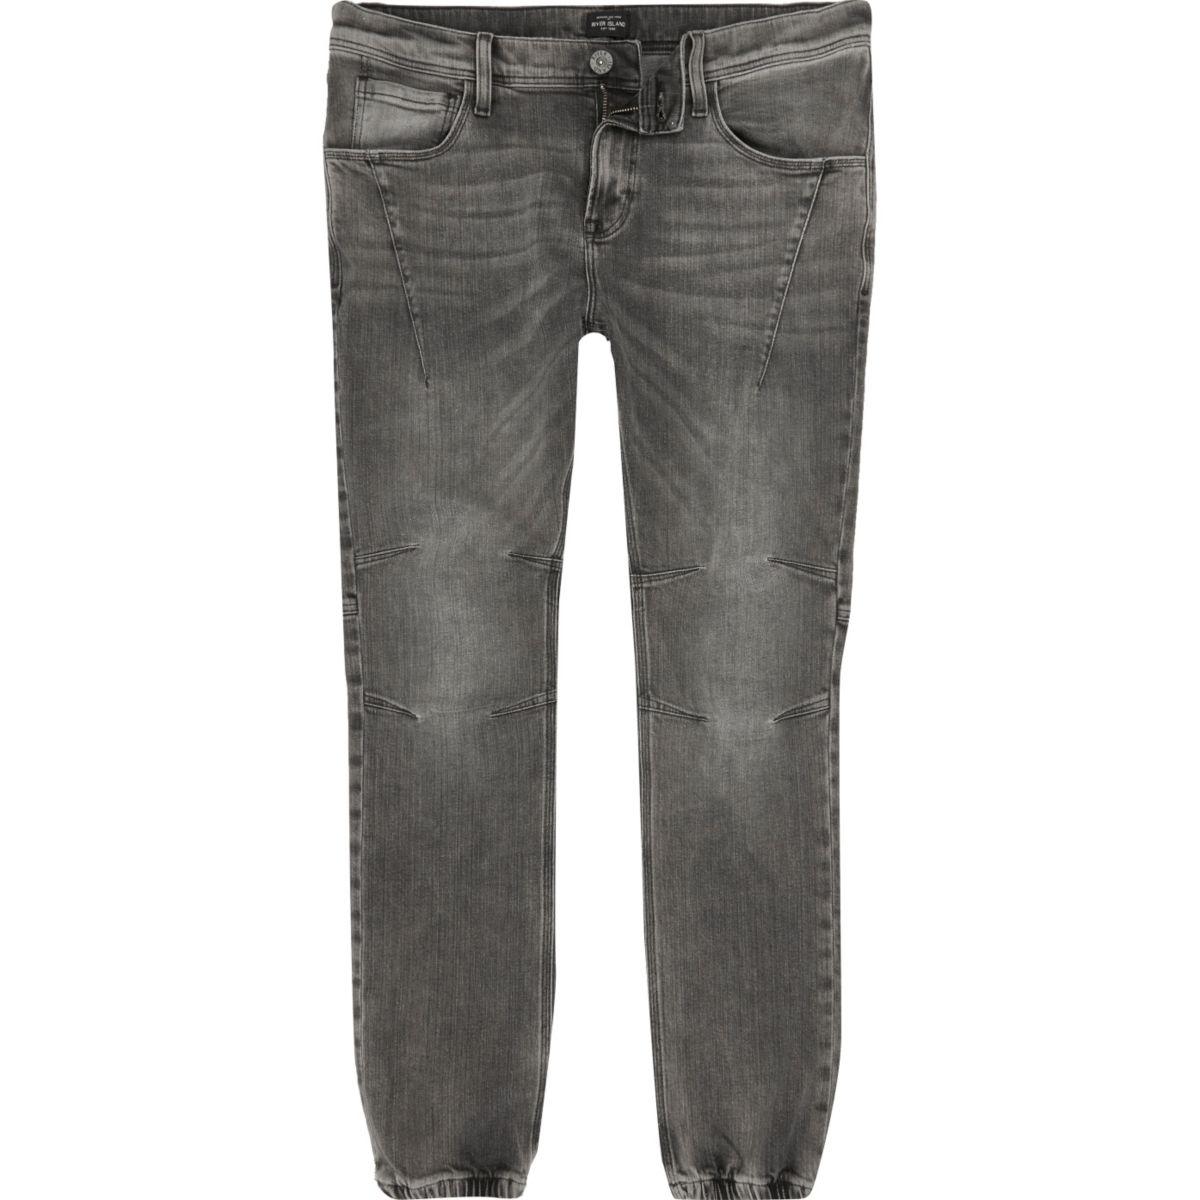 Grey wash Ryan jogger jeans